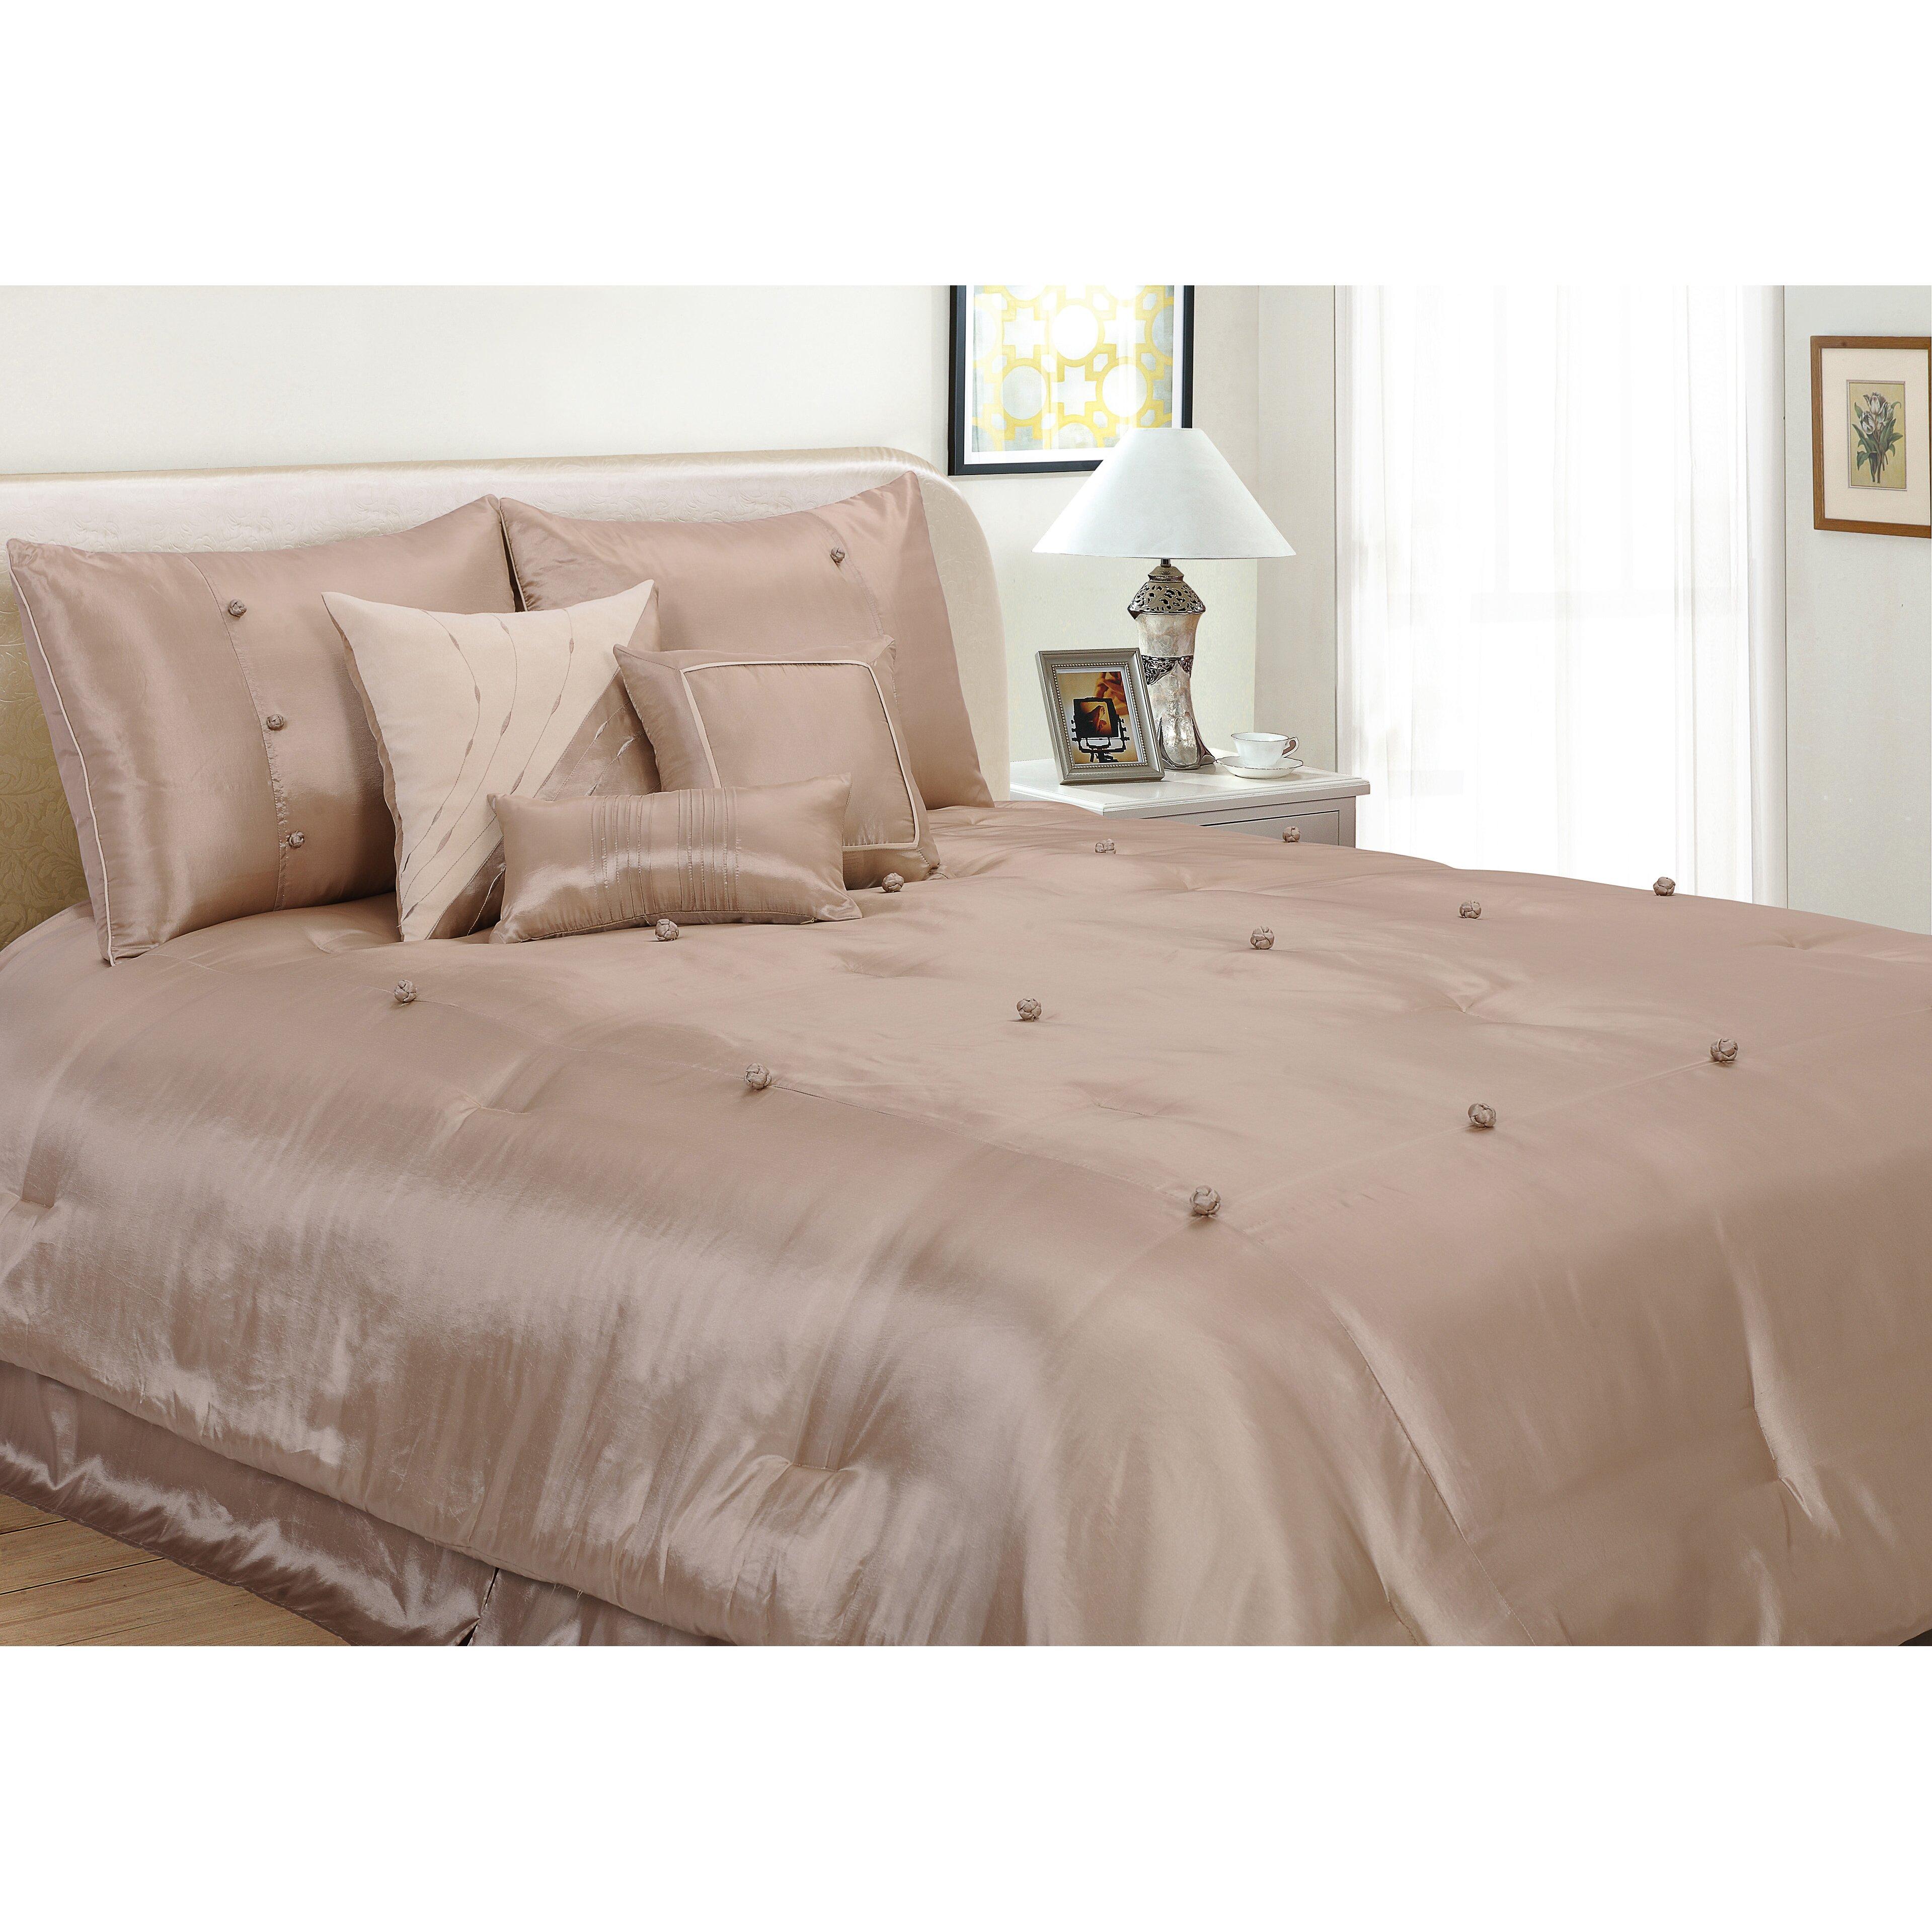 House of hampton stockton on tees 7 piece comforter set for House of hampton bedding